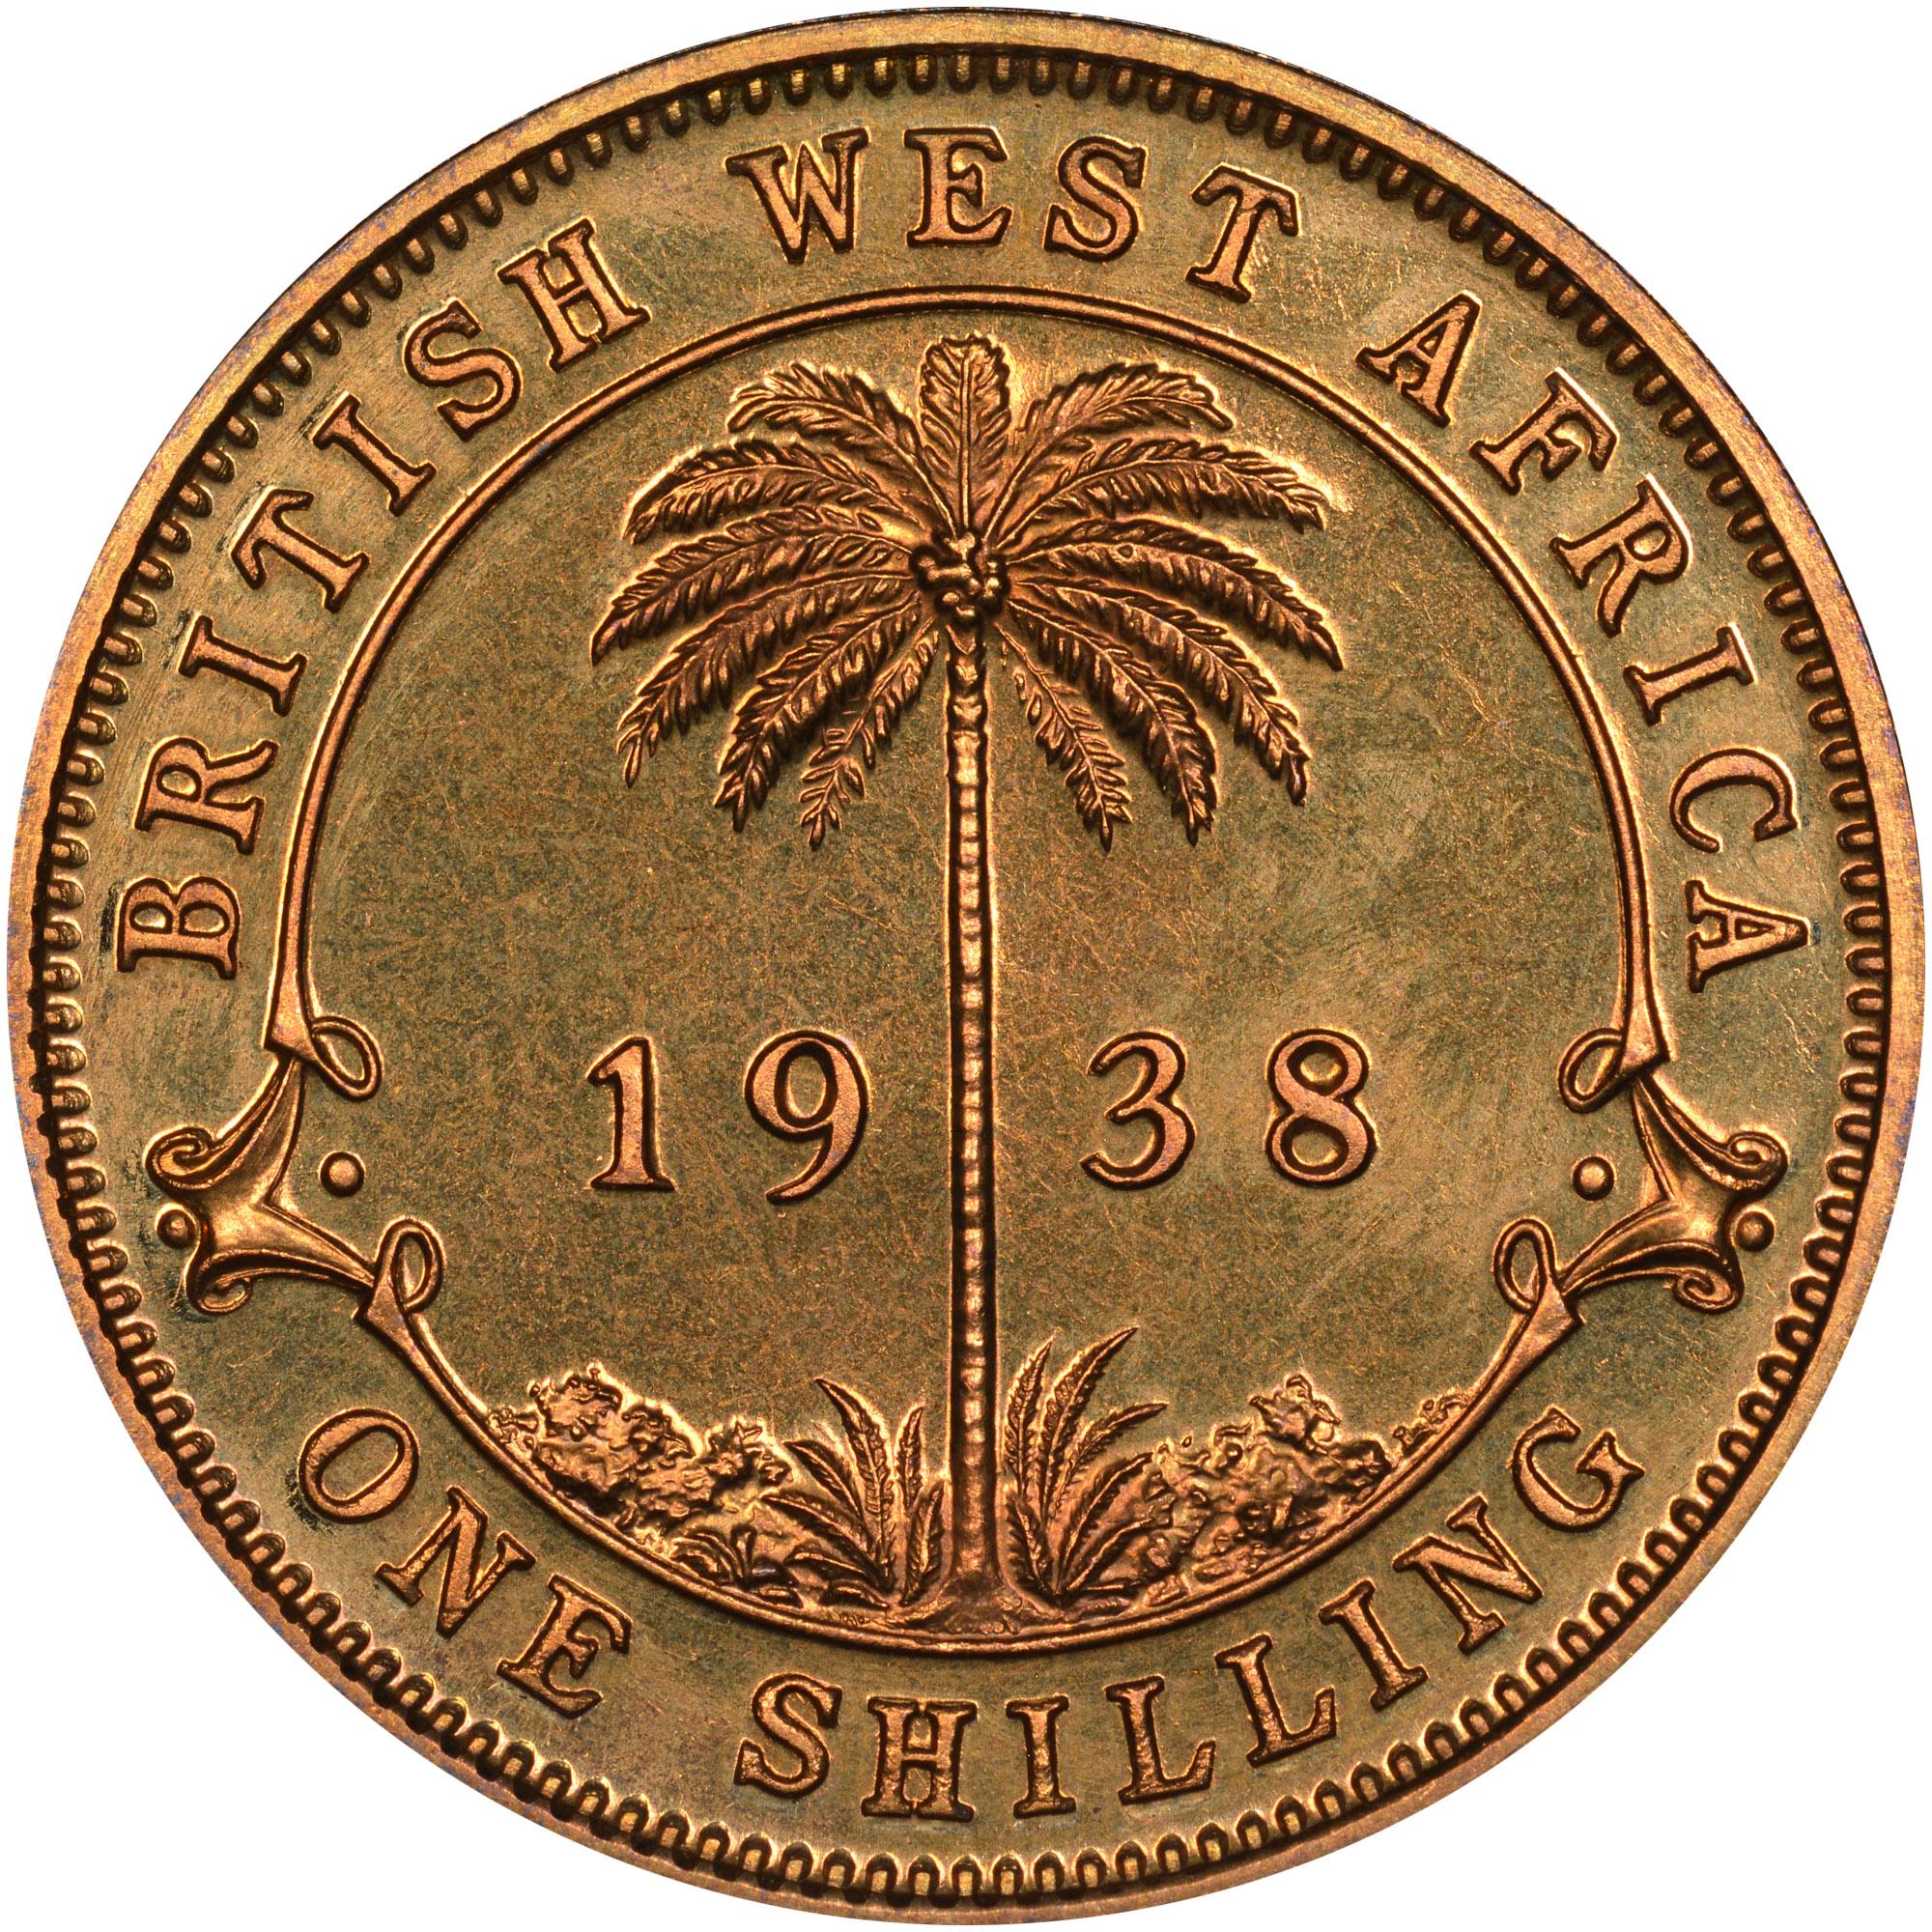 British West Africa Shilling reverse